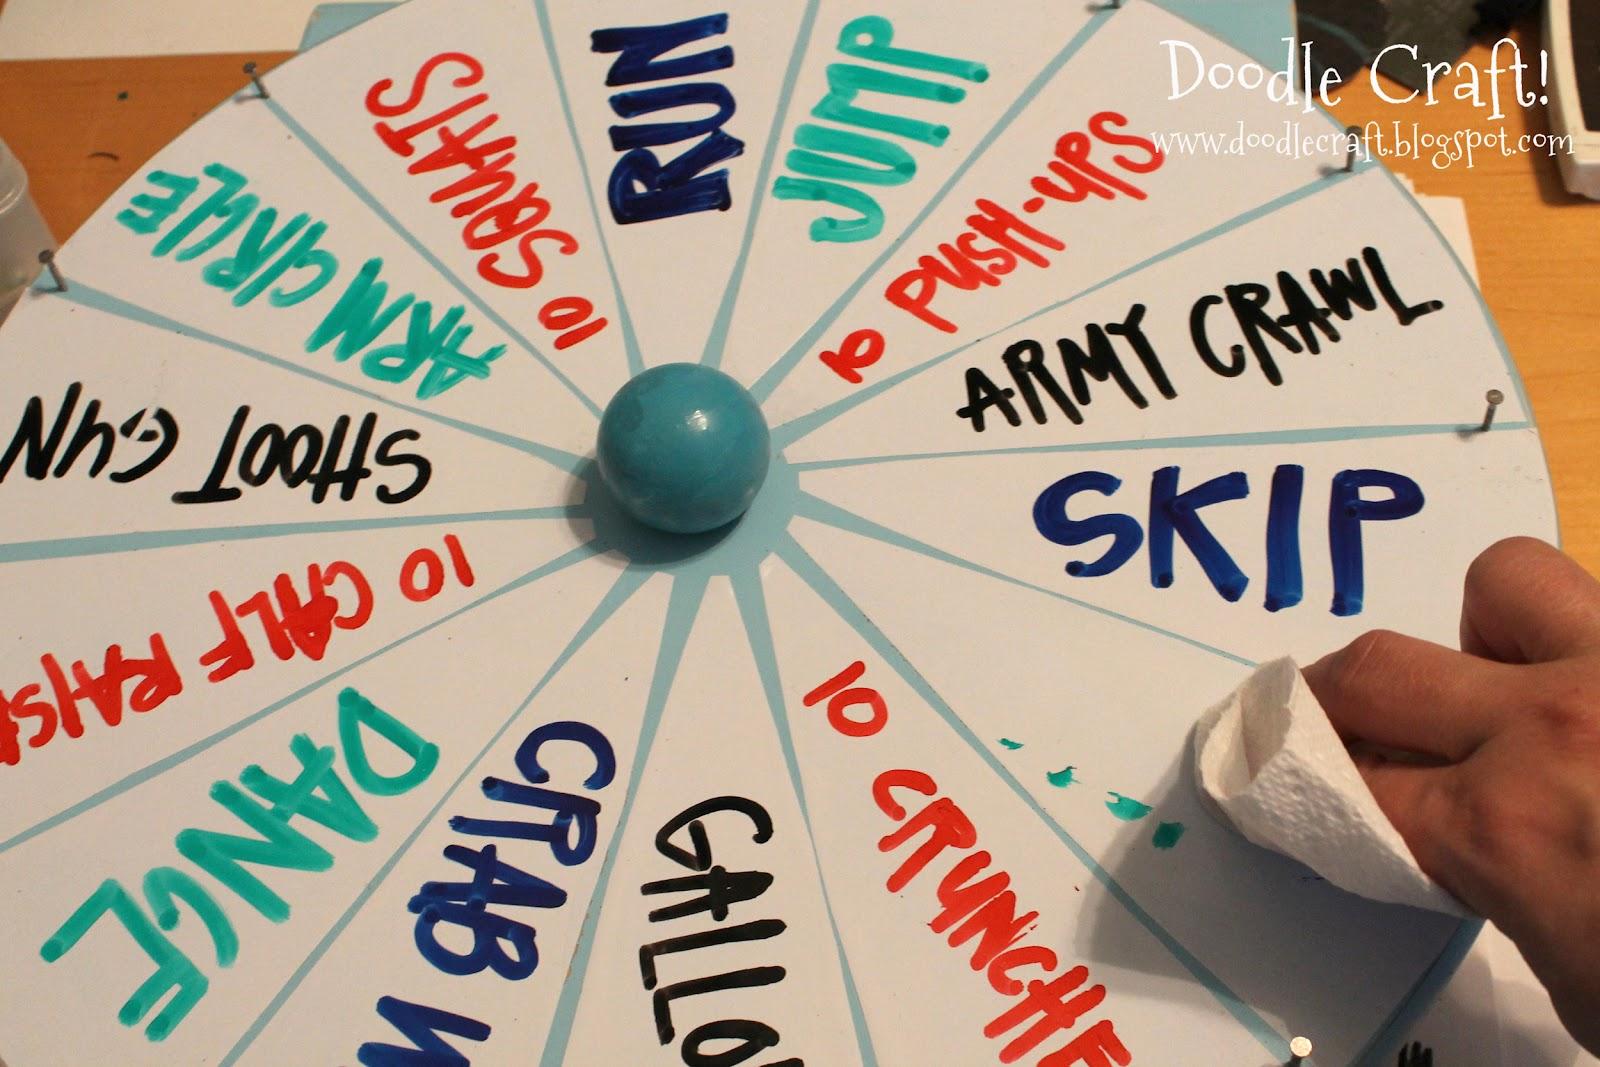 doodlecraft: super spinning prize wheel diy!